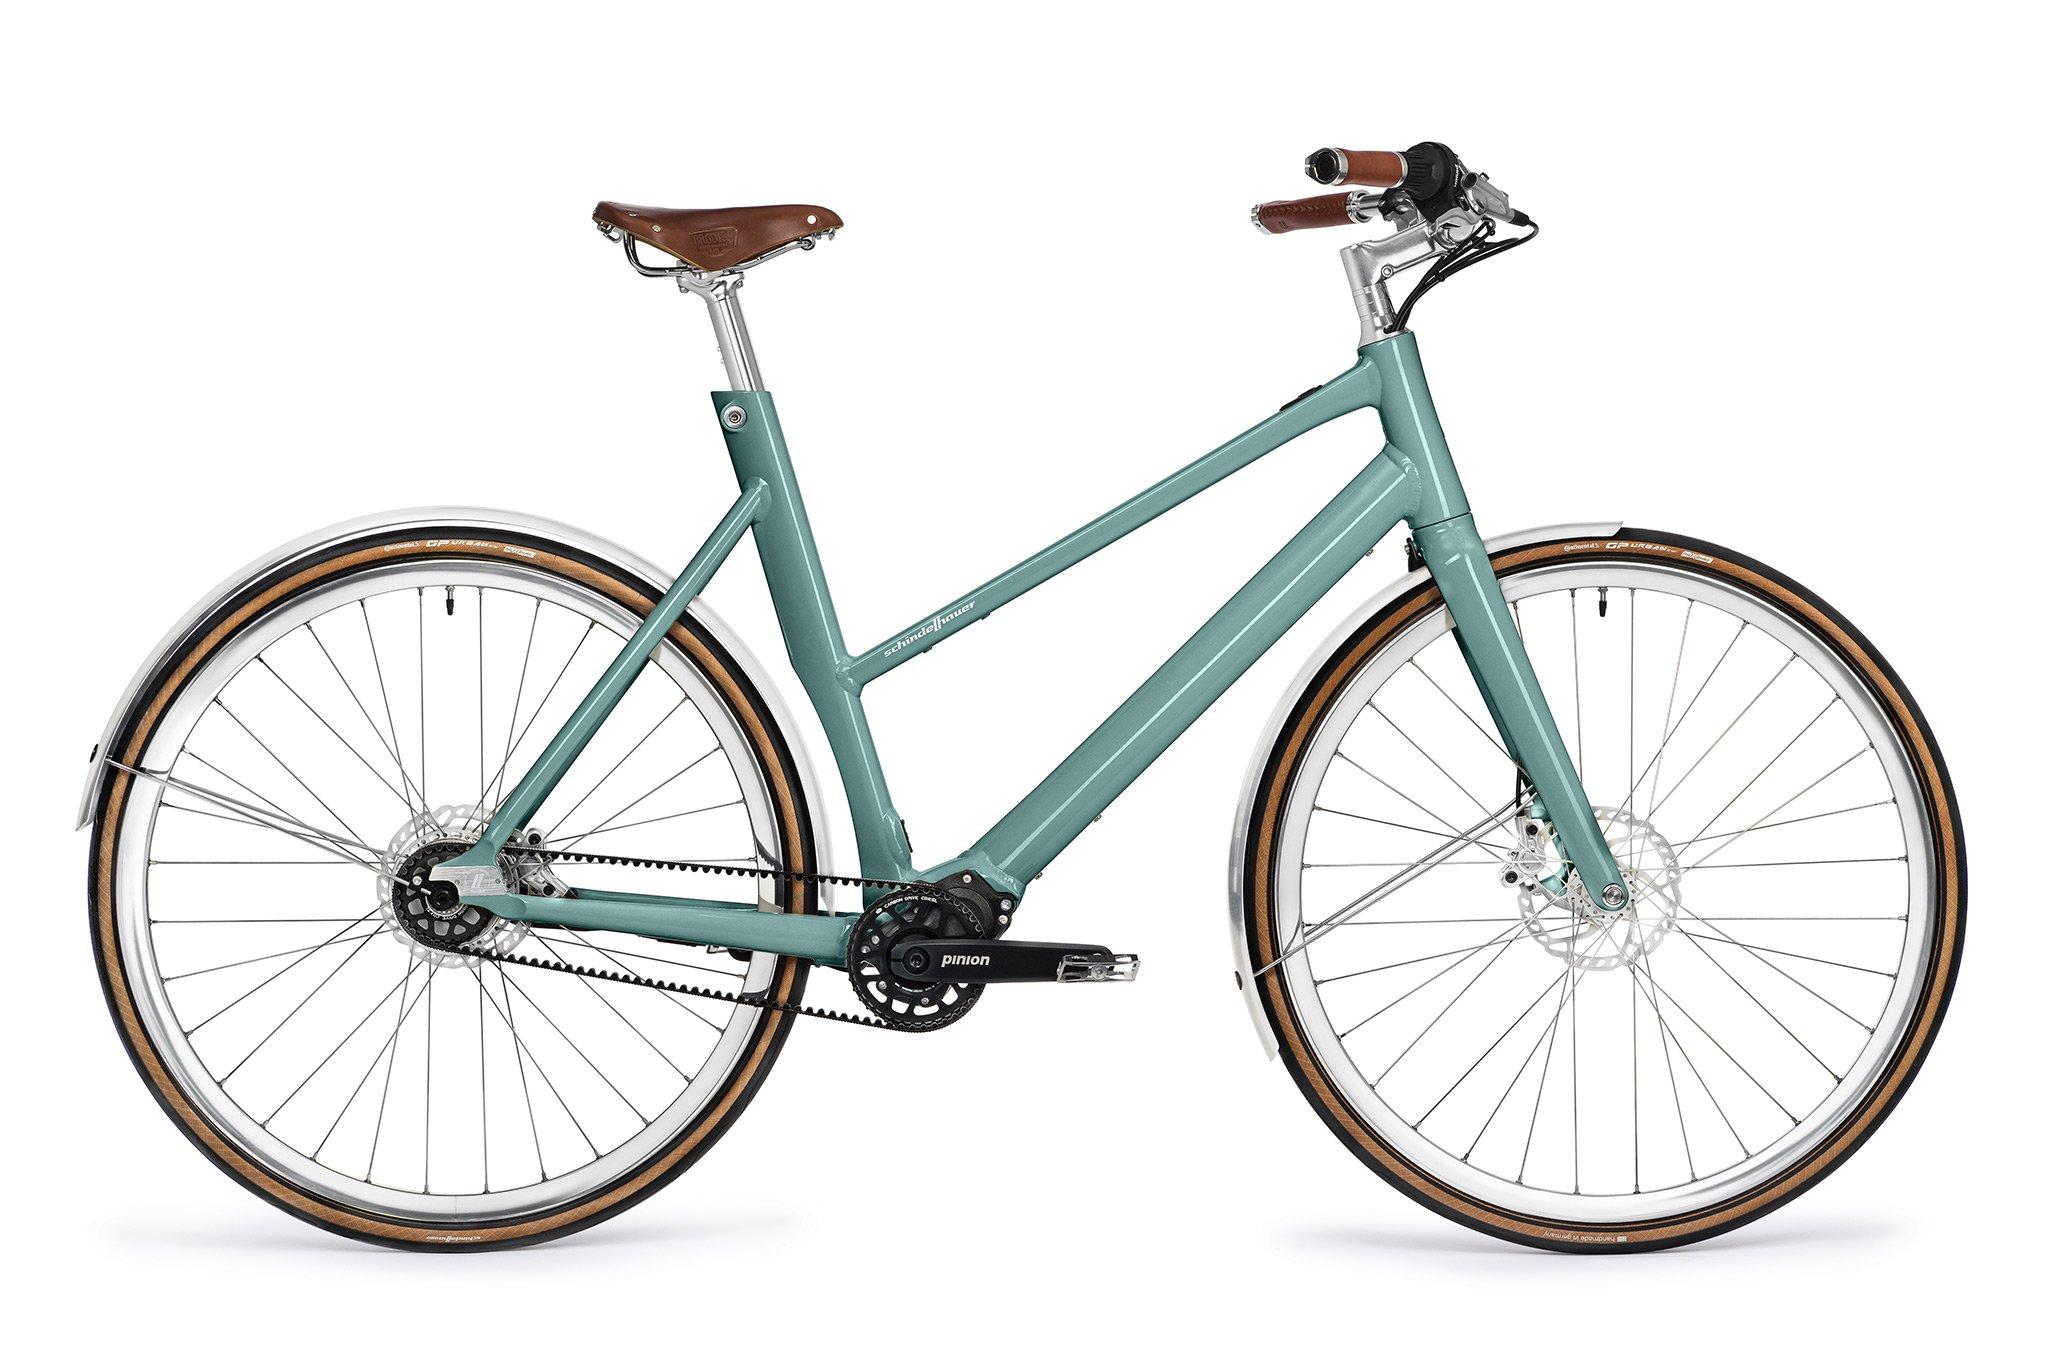 schindelhauer Antonia Pinion e-bike